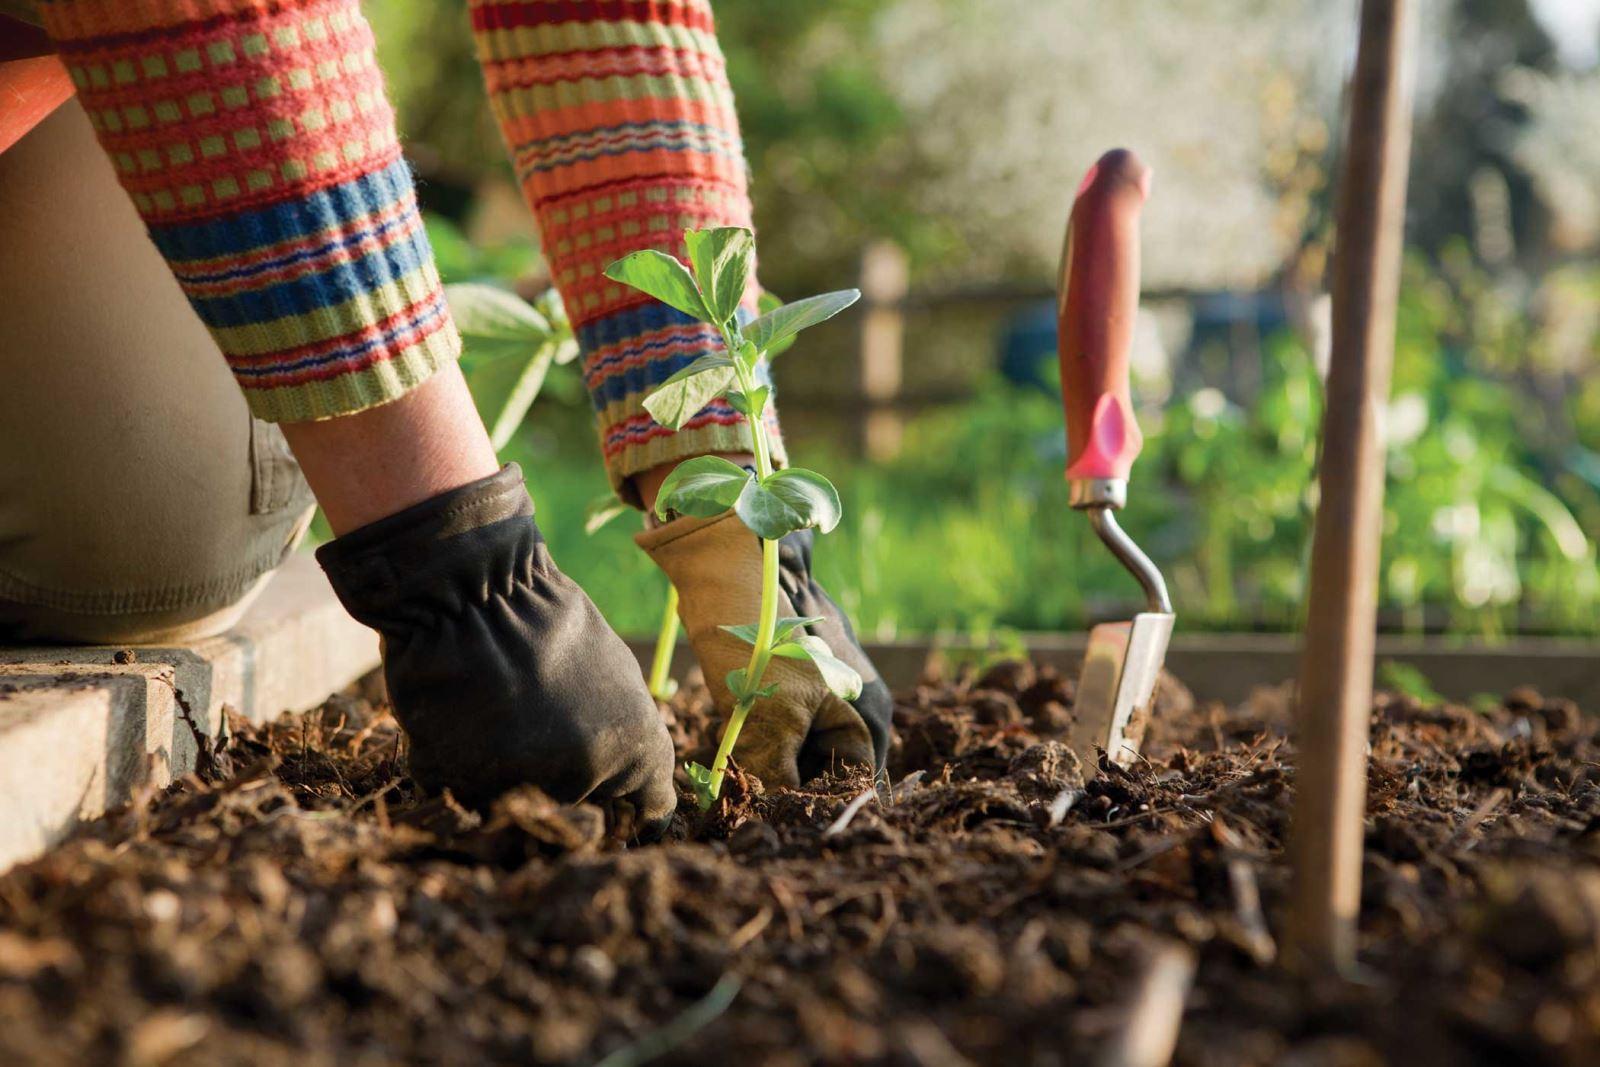 Что посадить на зиму на даче в теплице или огороде?